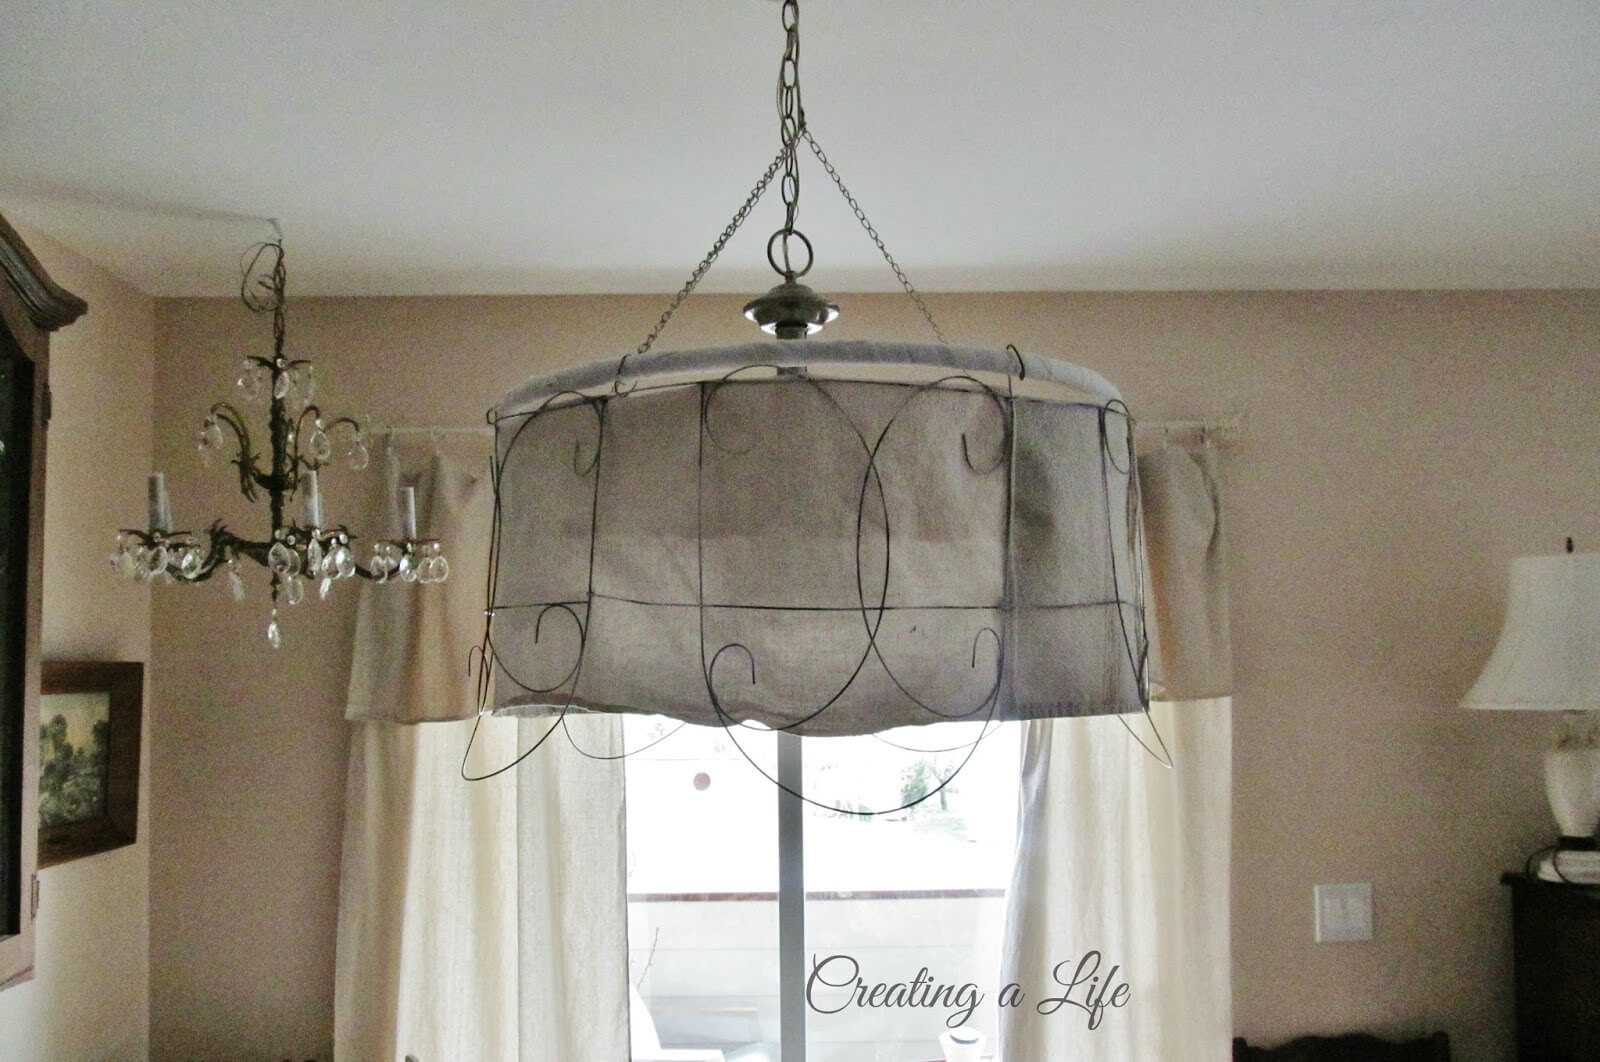 Decorative Wire Pendant Light With Burlap Lining